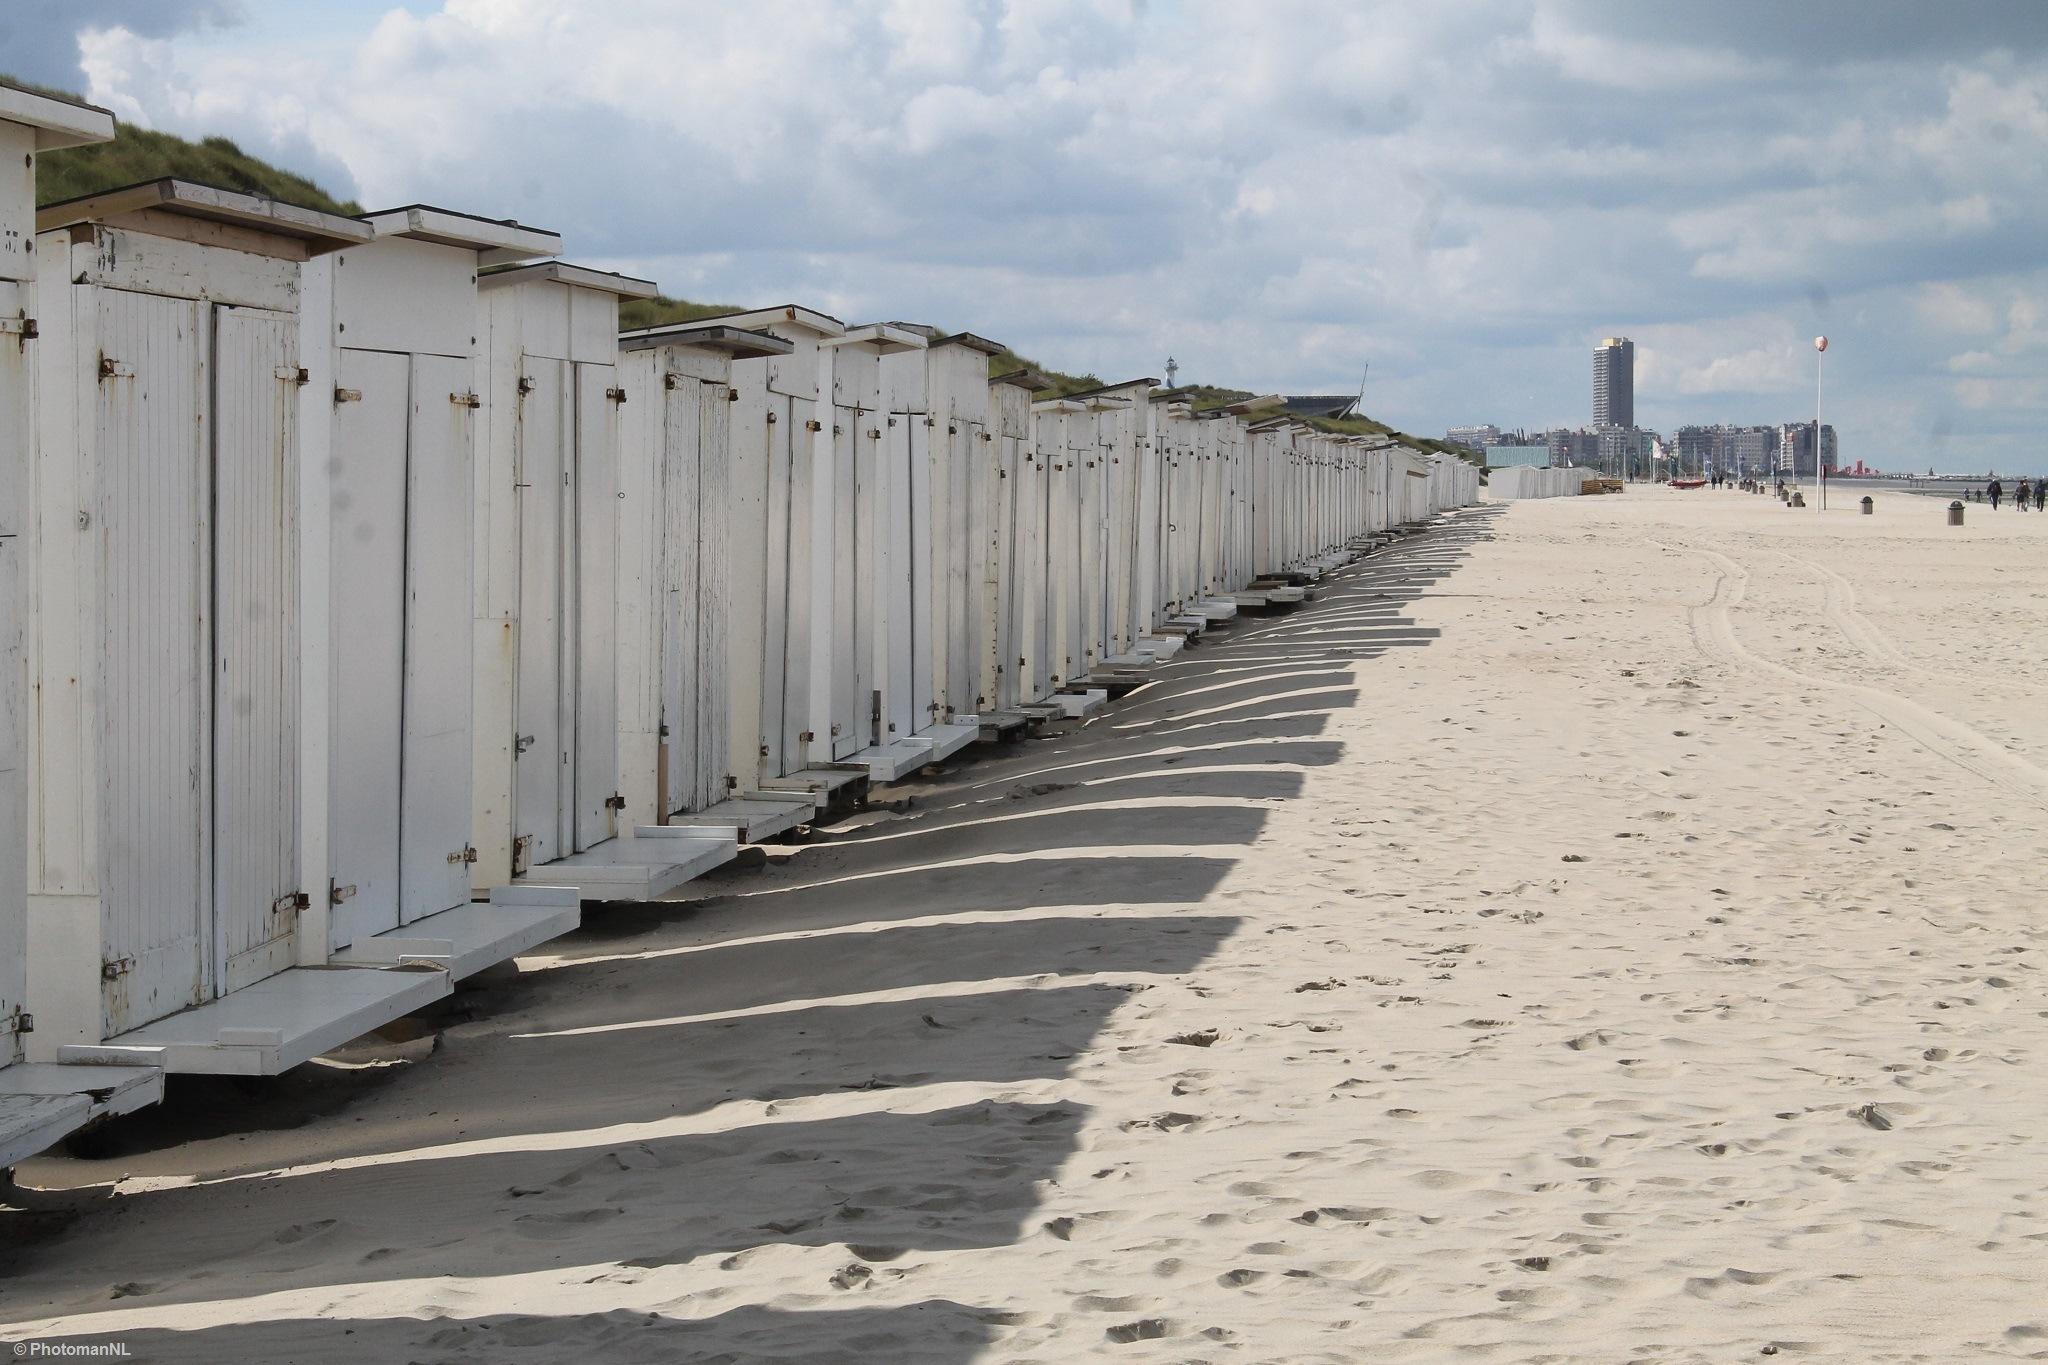 Beach at Bredene  by PhotomanNL